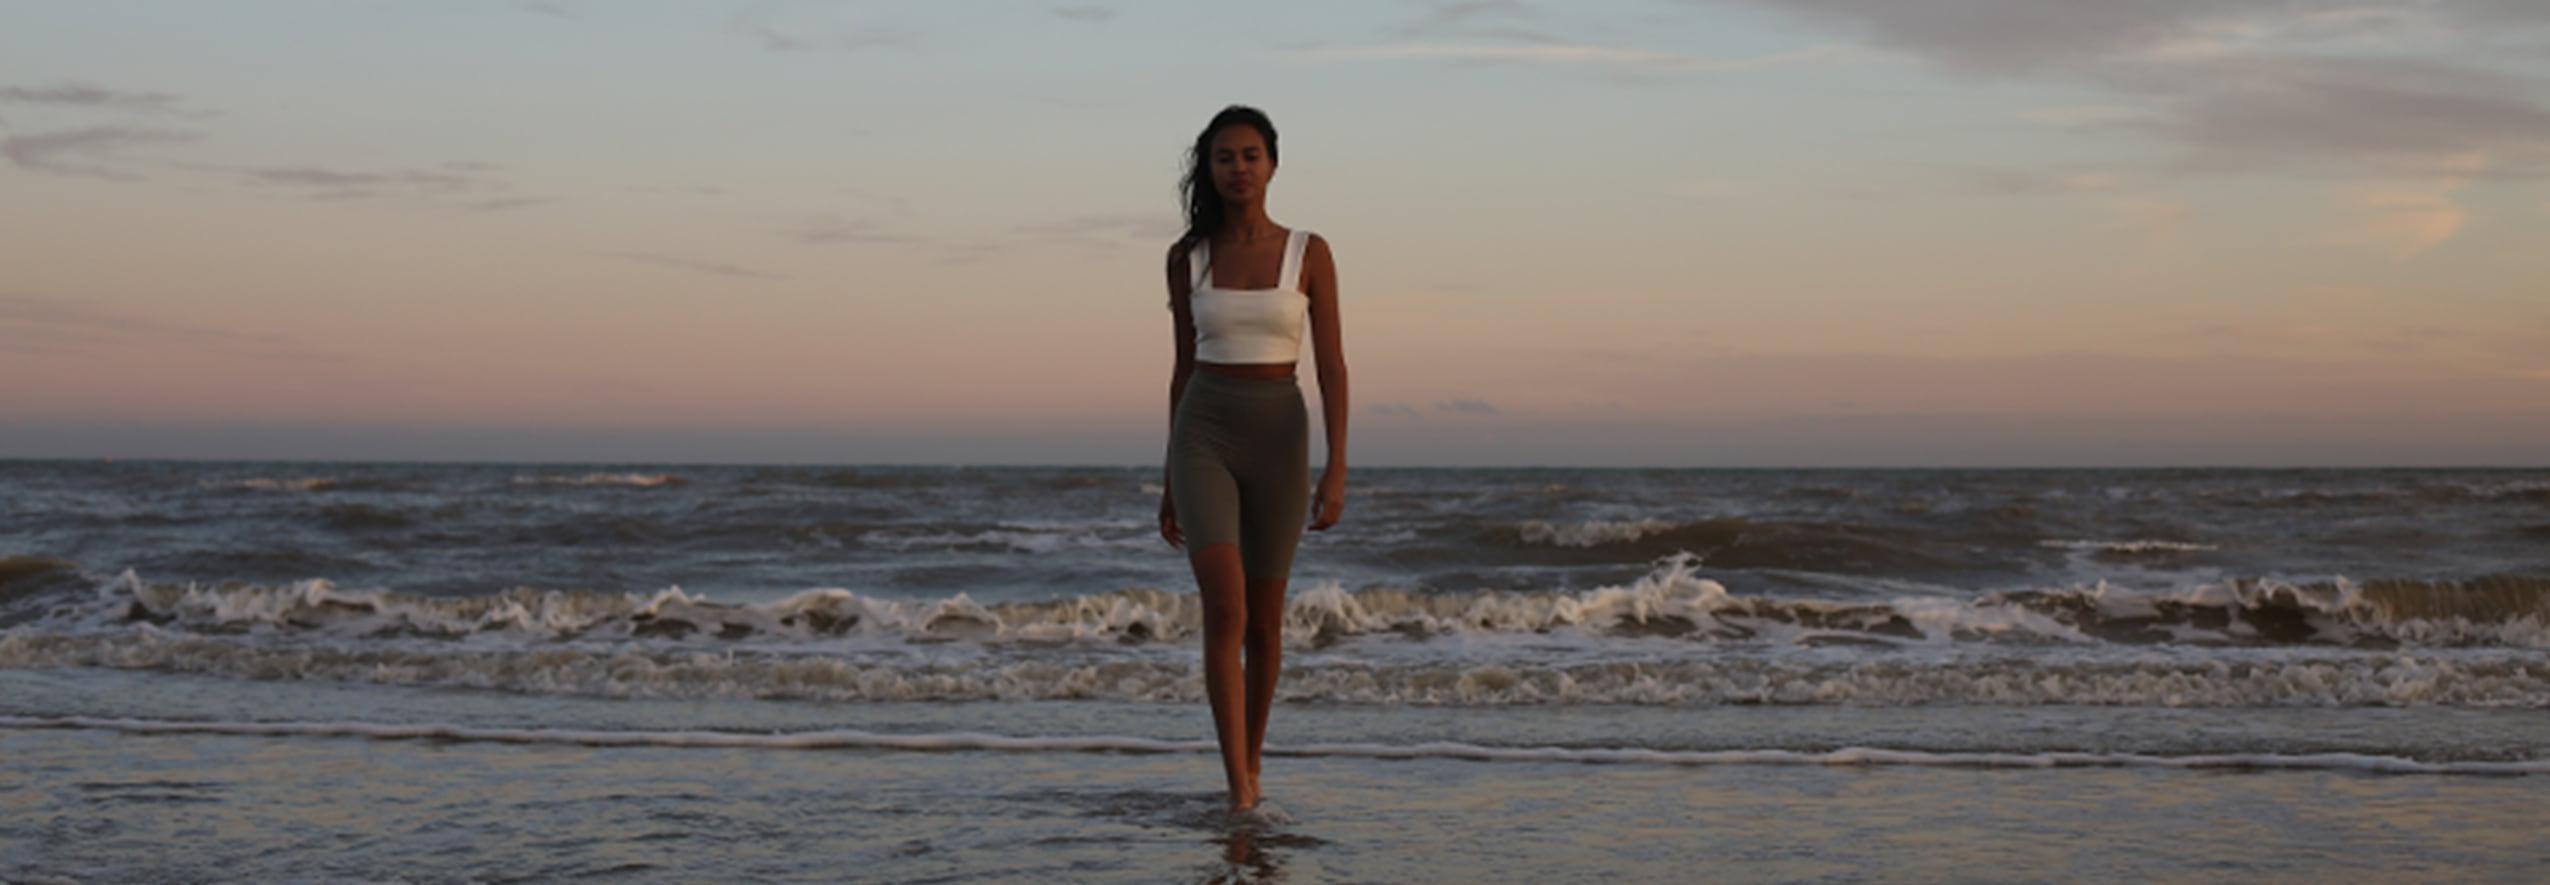 Woman in good health walking on the beach